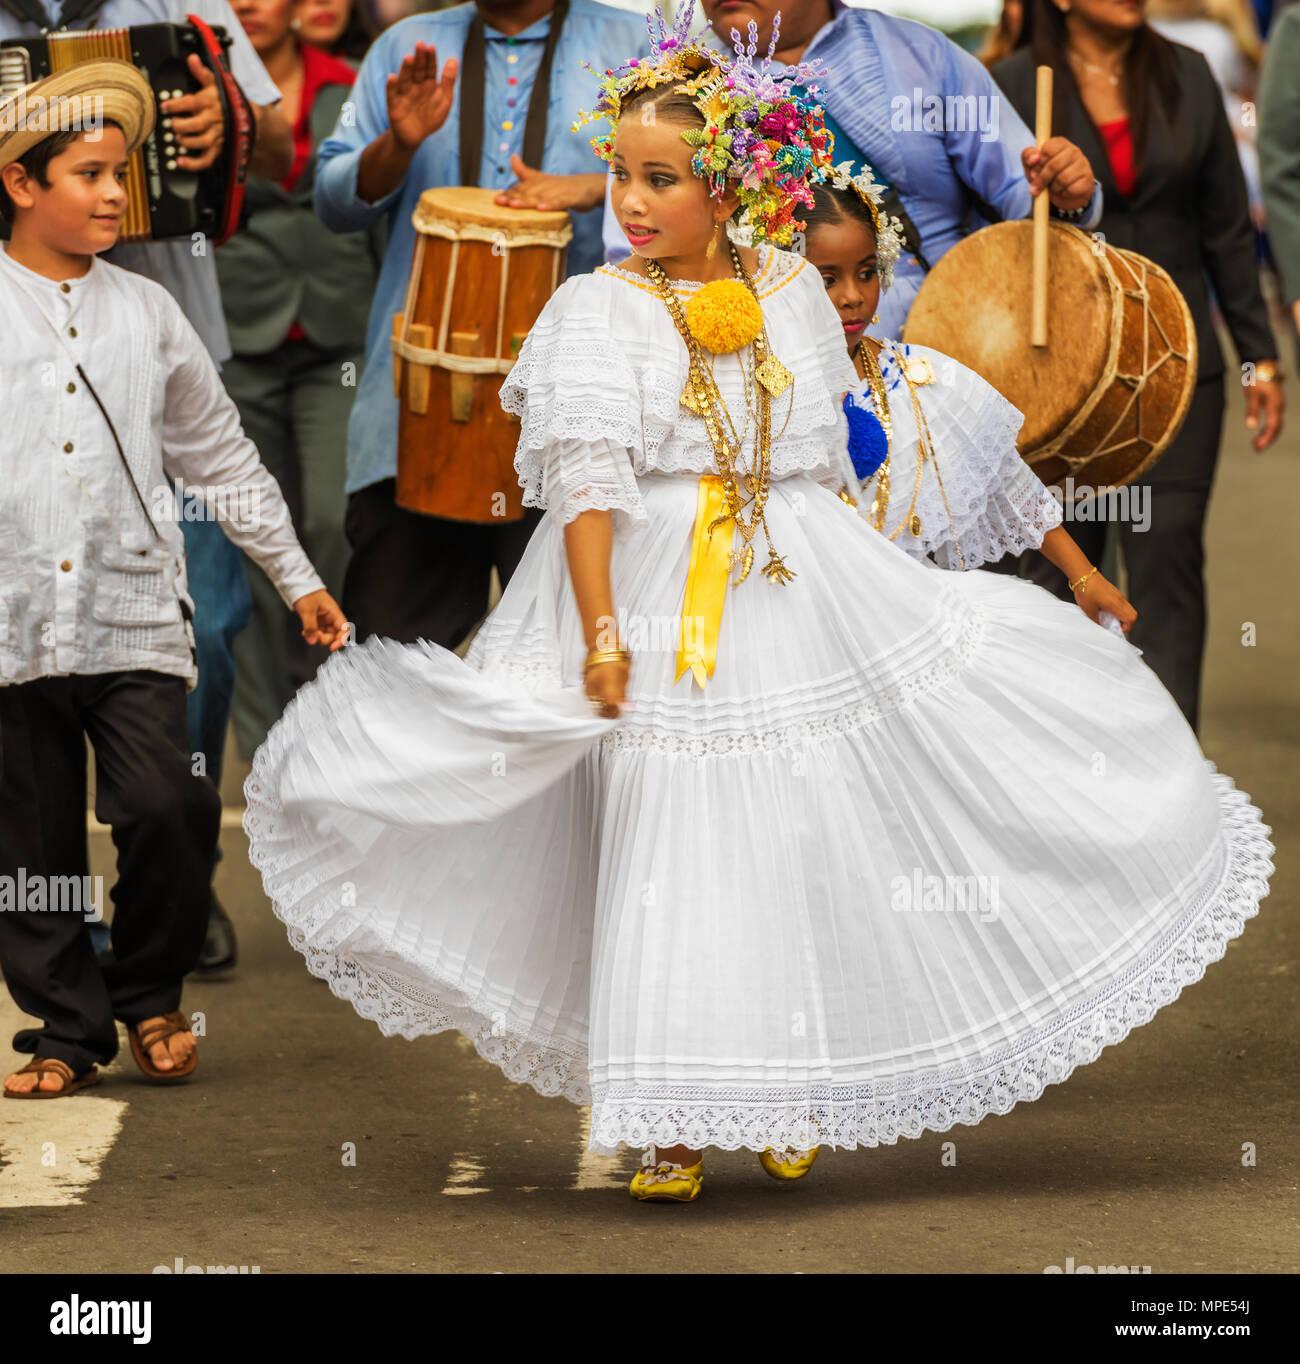 Chitre Panama Noviembre 19 2016 Vestida Con Traje Tradicional